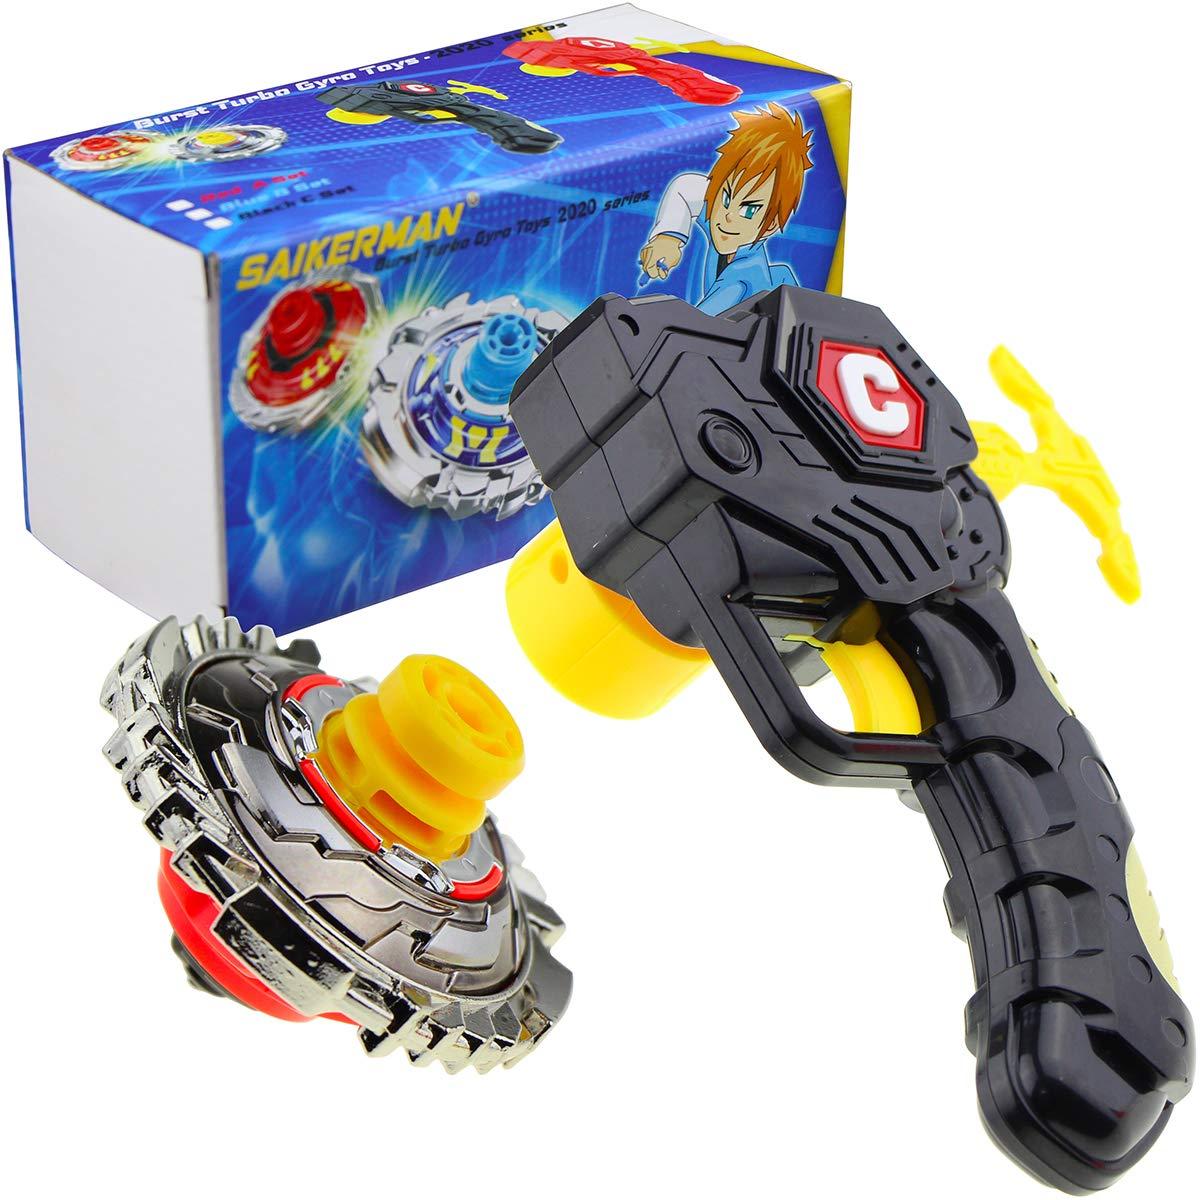 SaikerMan Metal Burst Battling Turbo Top and Launcher Toy for Age 8+ - Black Set by SaikerMan